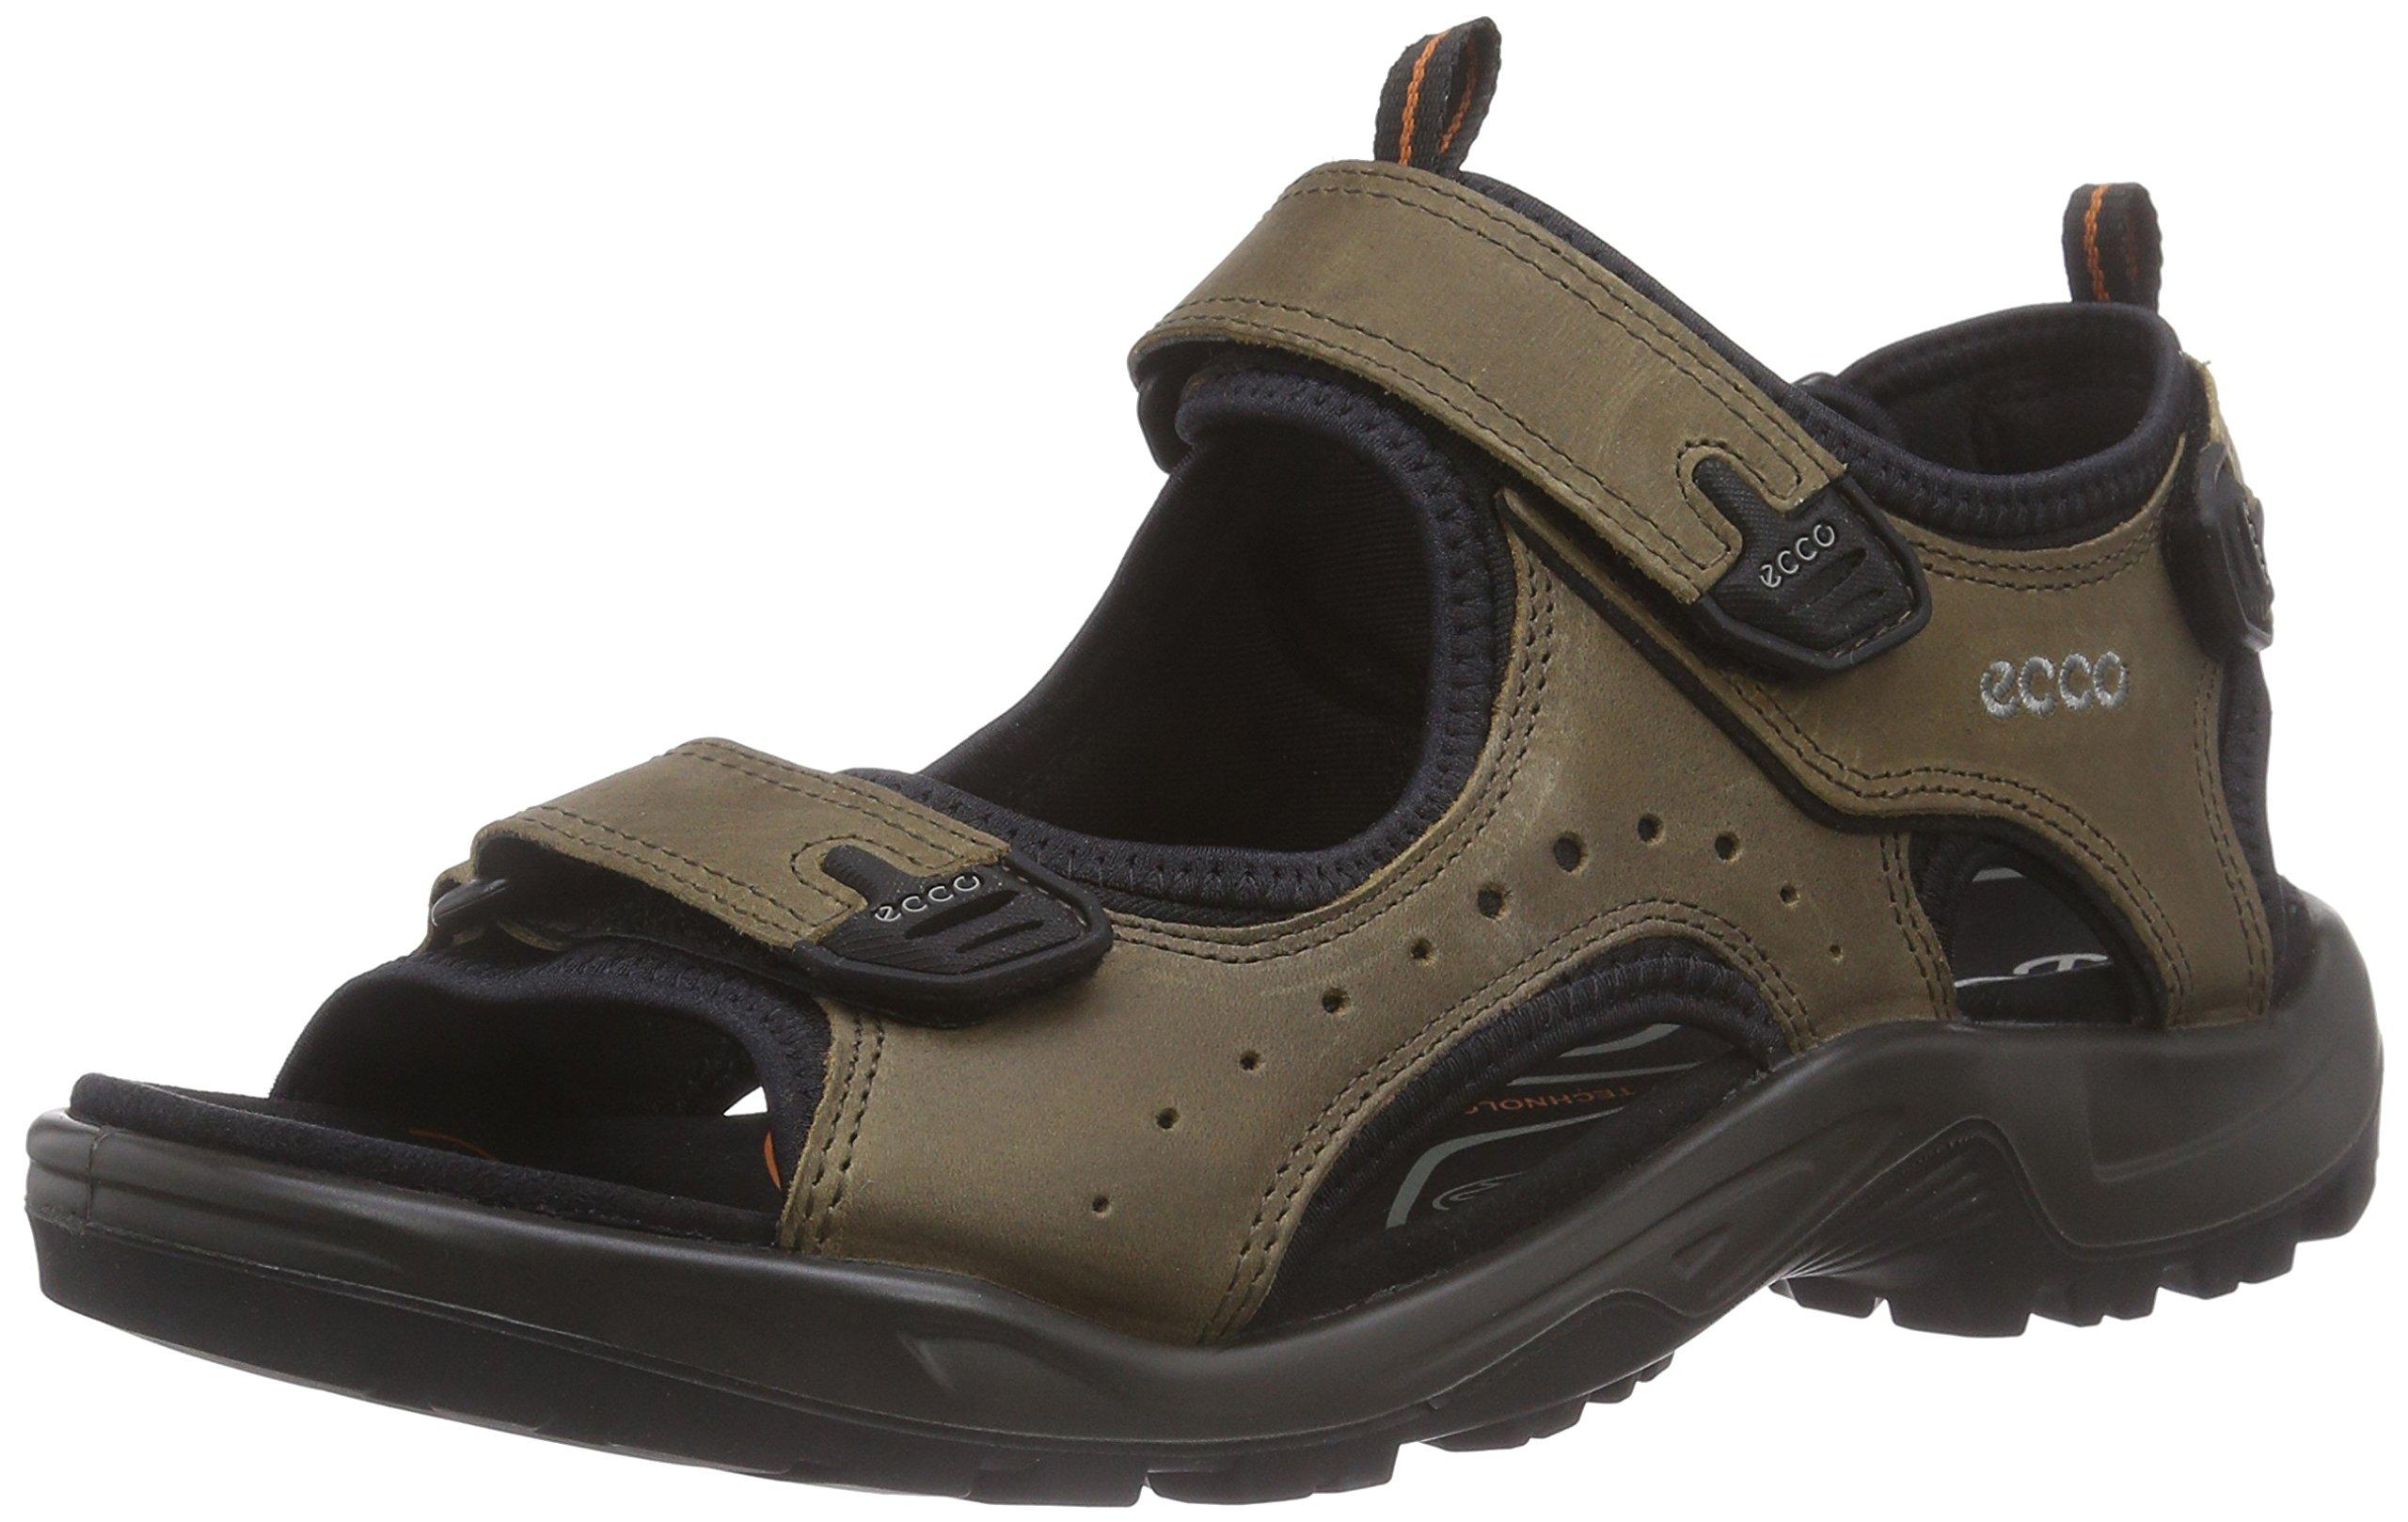 c33d0ab95f8c ECCO Men s Offroad Peeptoe Sandals. Ecco 822094 Offroad – 01280 Brandy Pull  Up